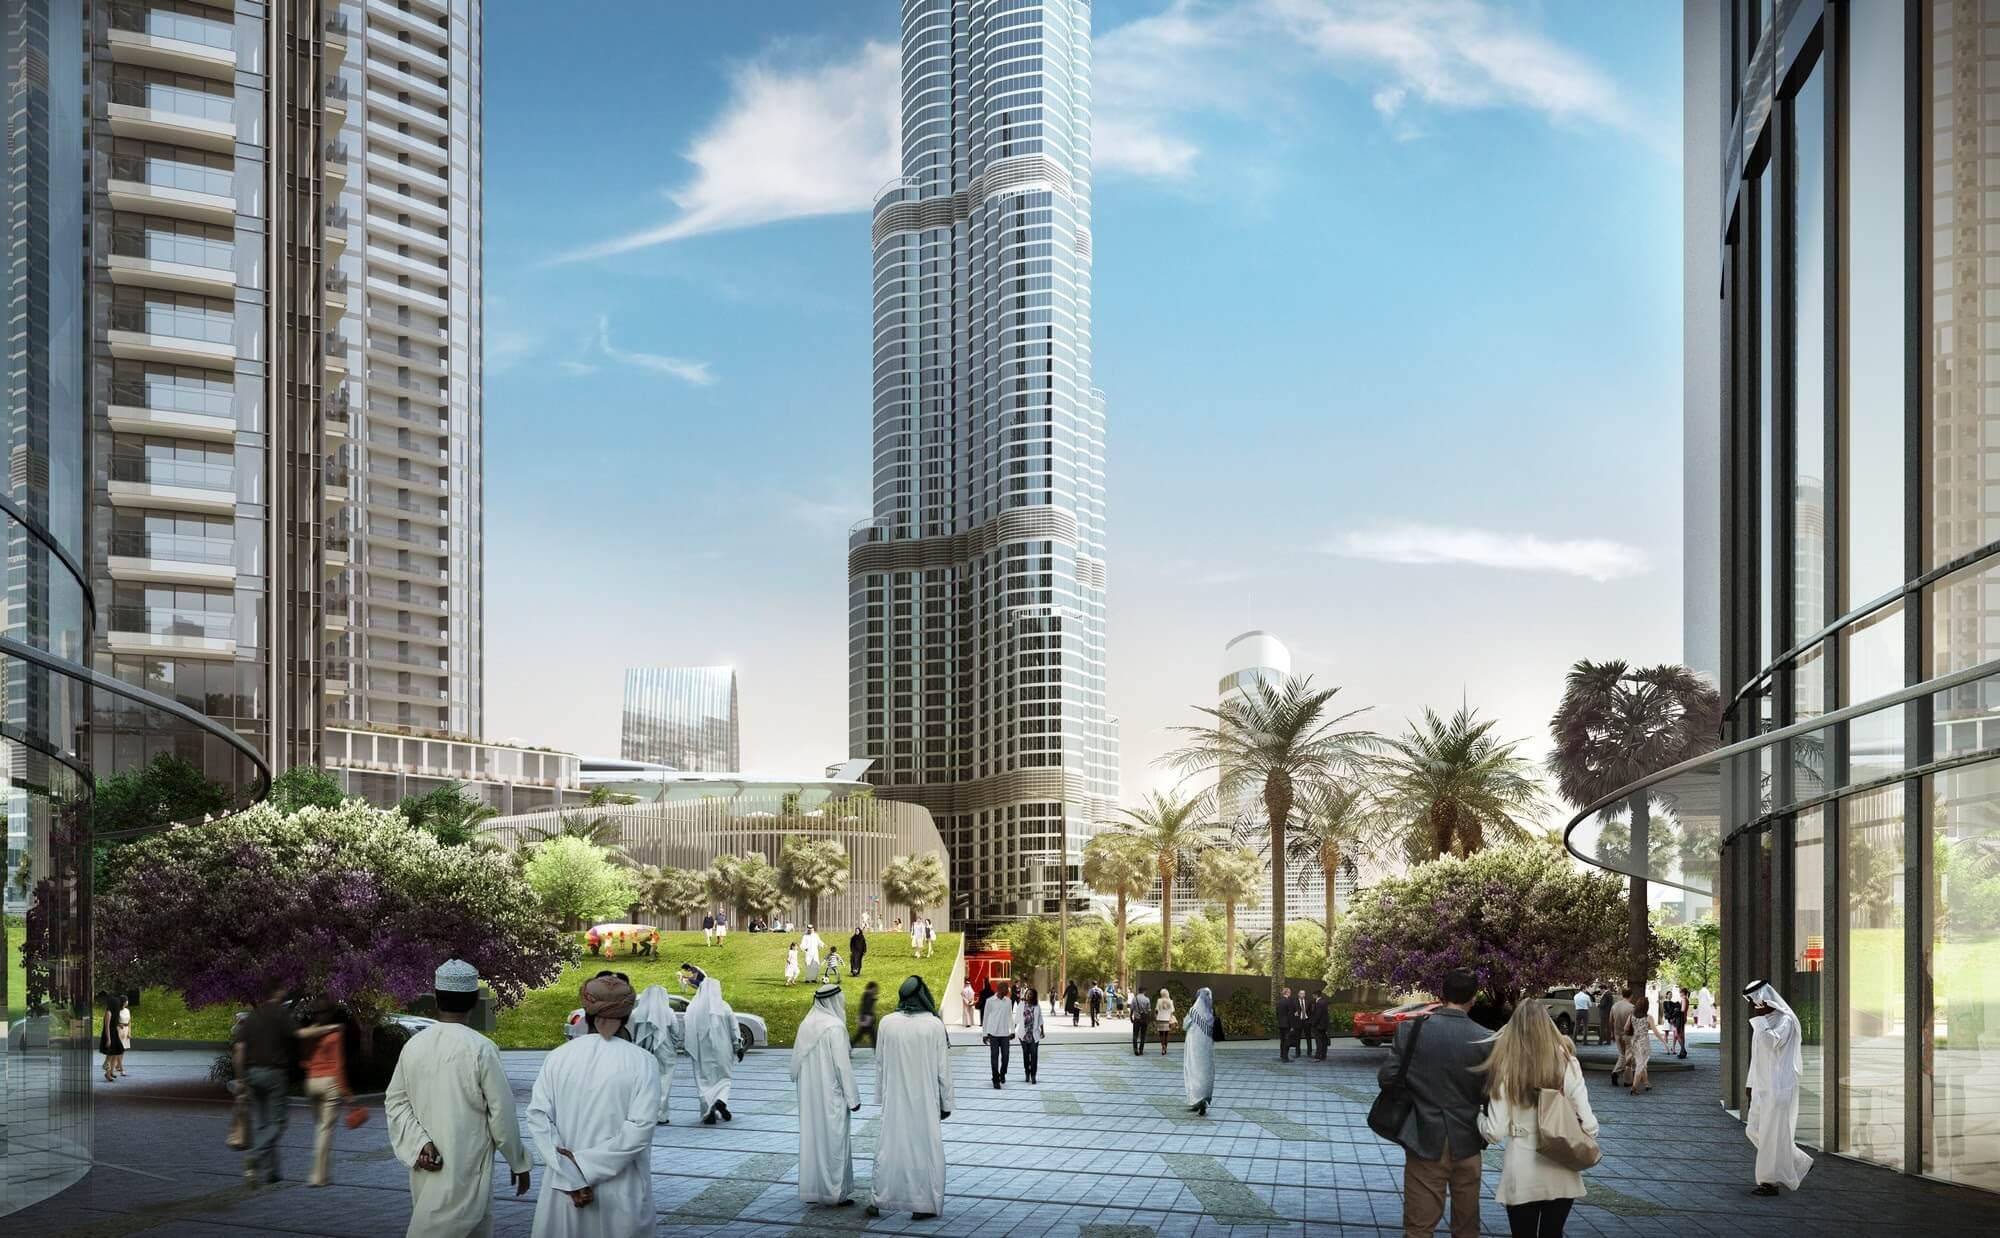 EF001-01-C04-R08-Park-to-Burj-Khalifal-09